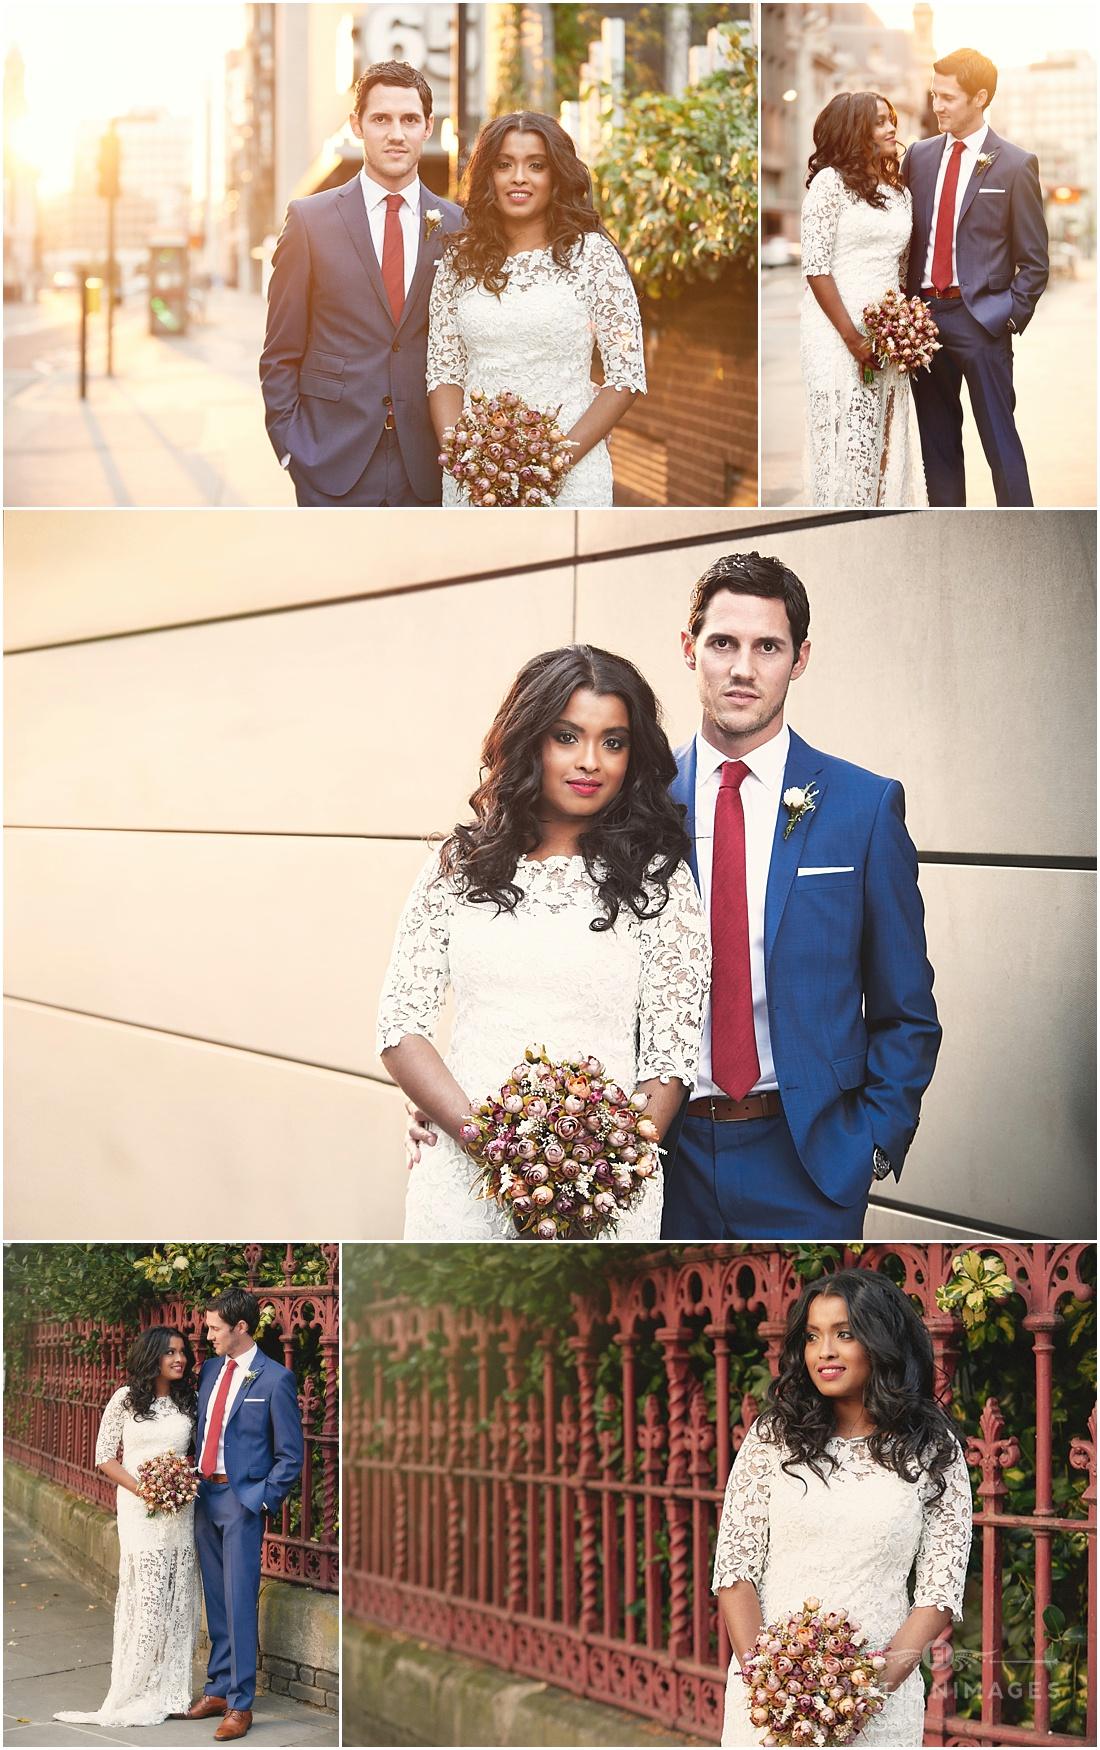 Fable_bar_London_wedding_photography_e-motion_images_002.JPG